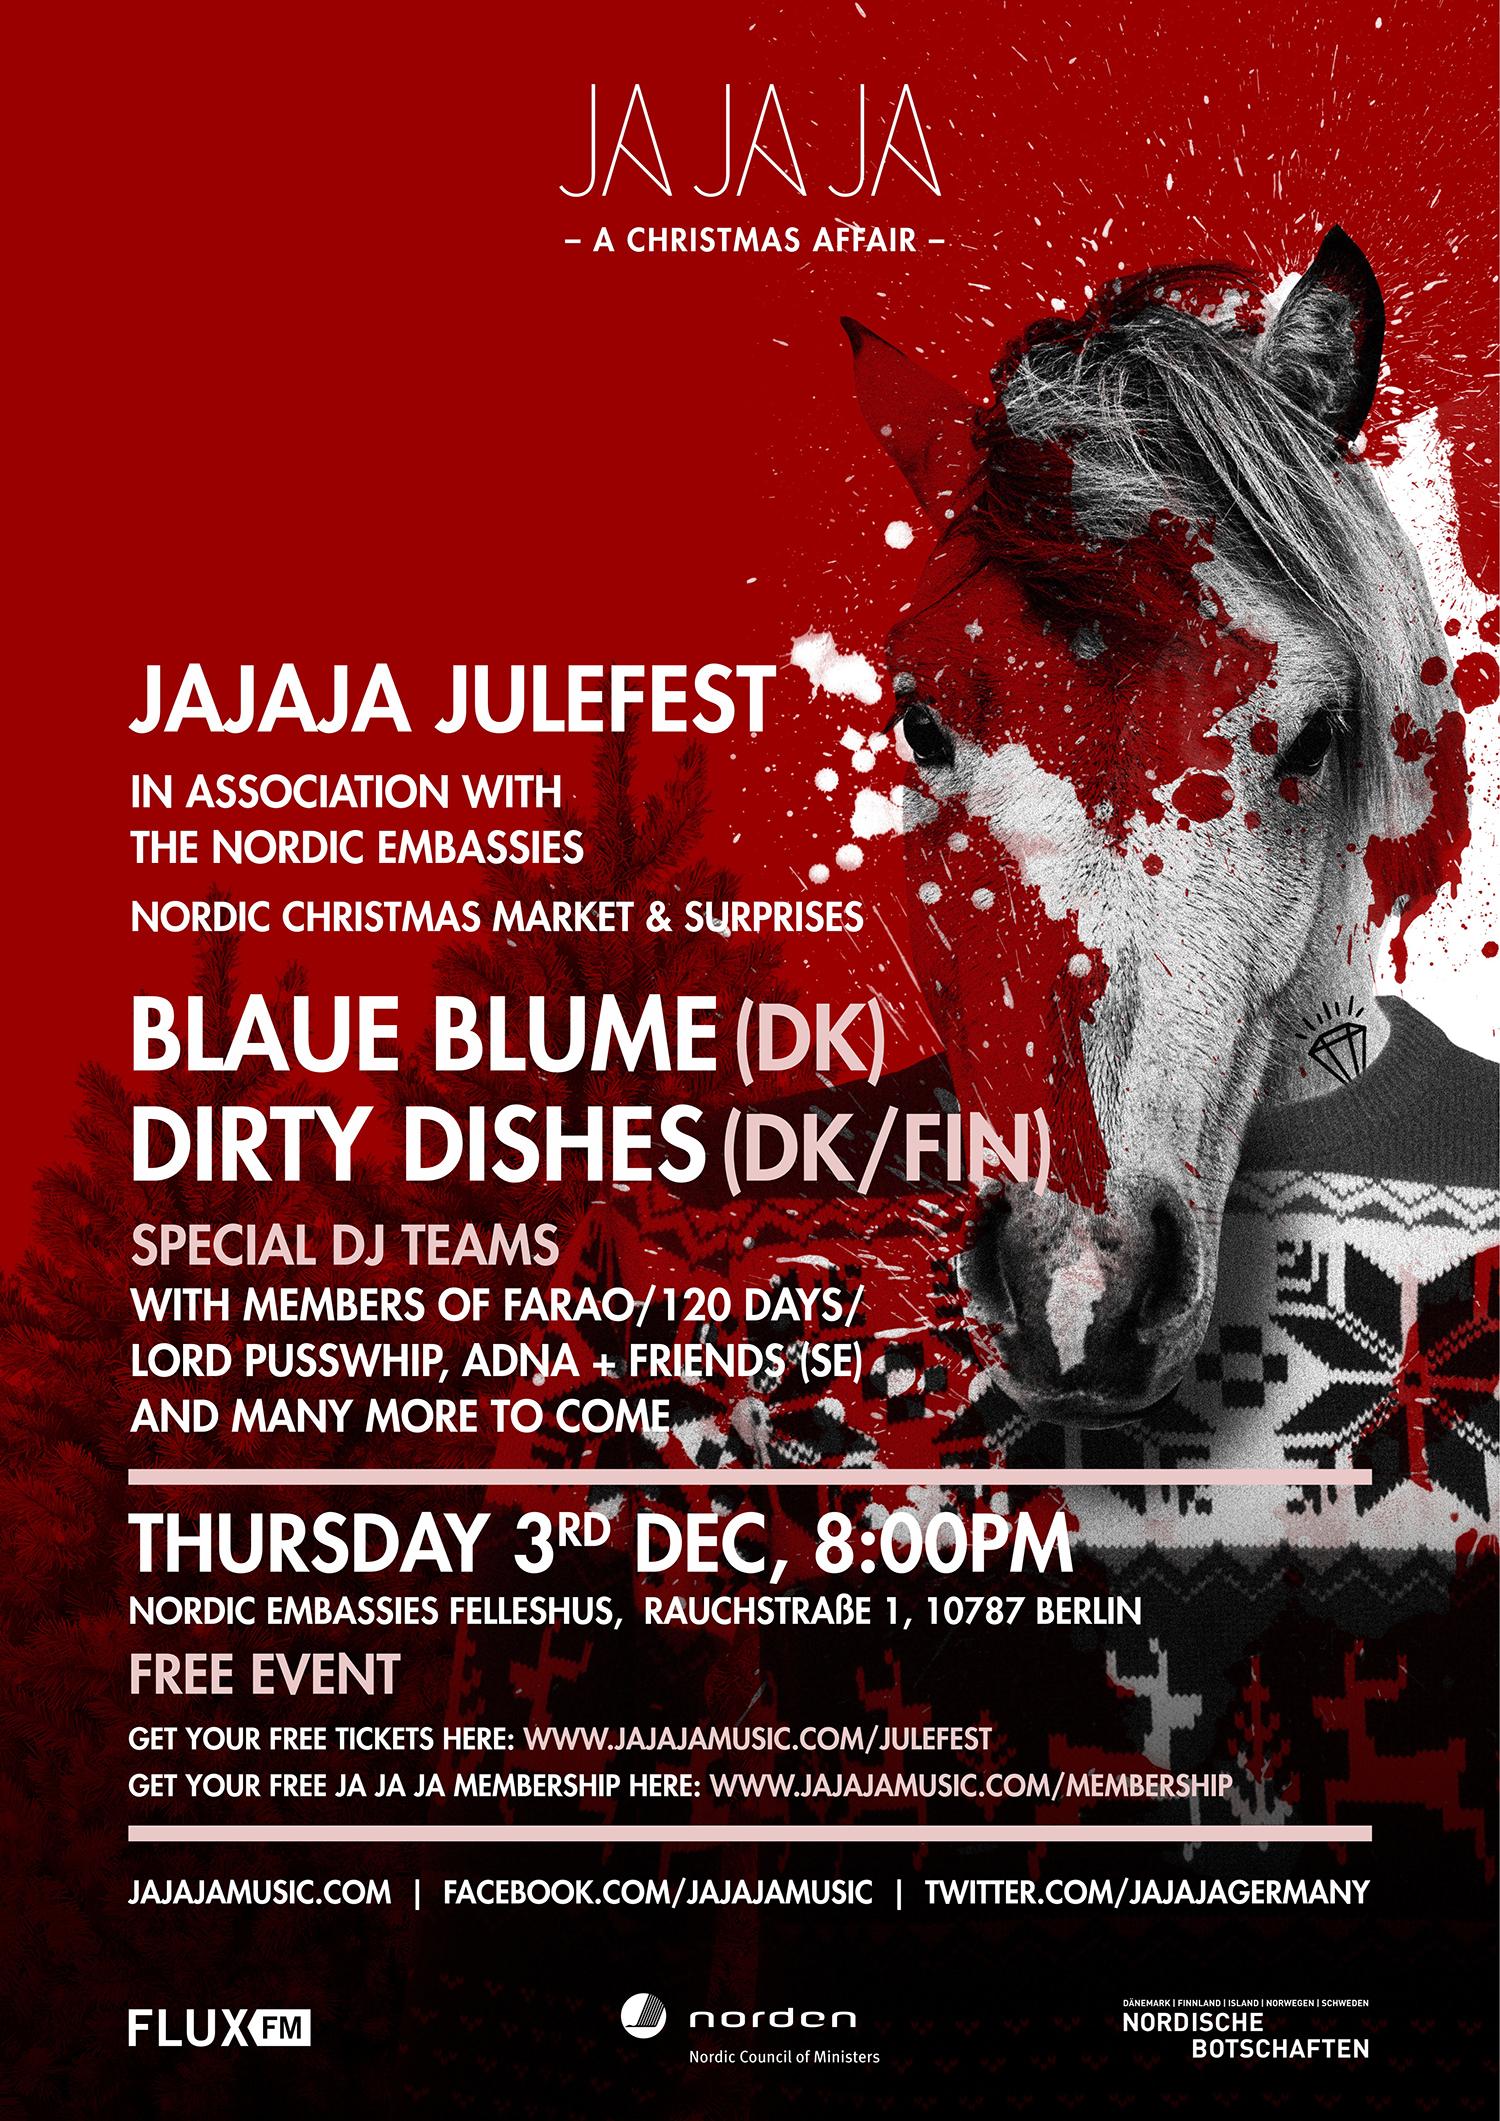 JaJaJa_Christmas_Horse_Poster JPG small